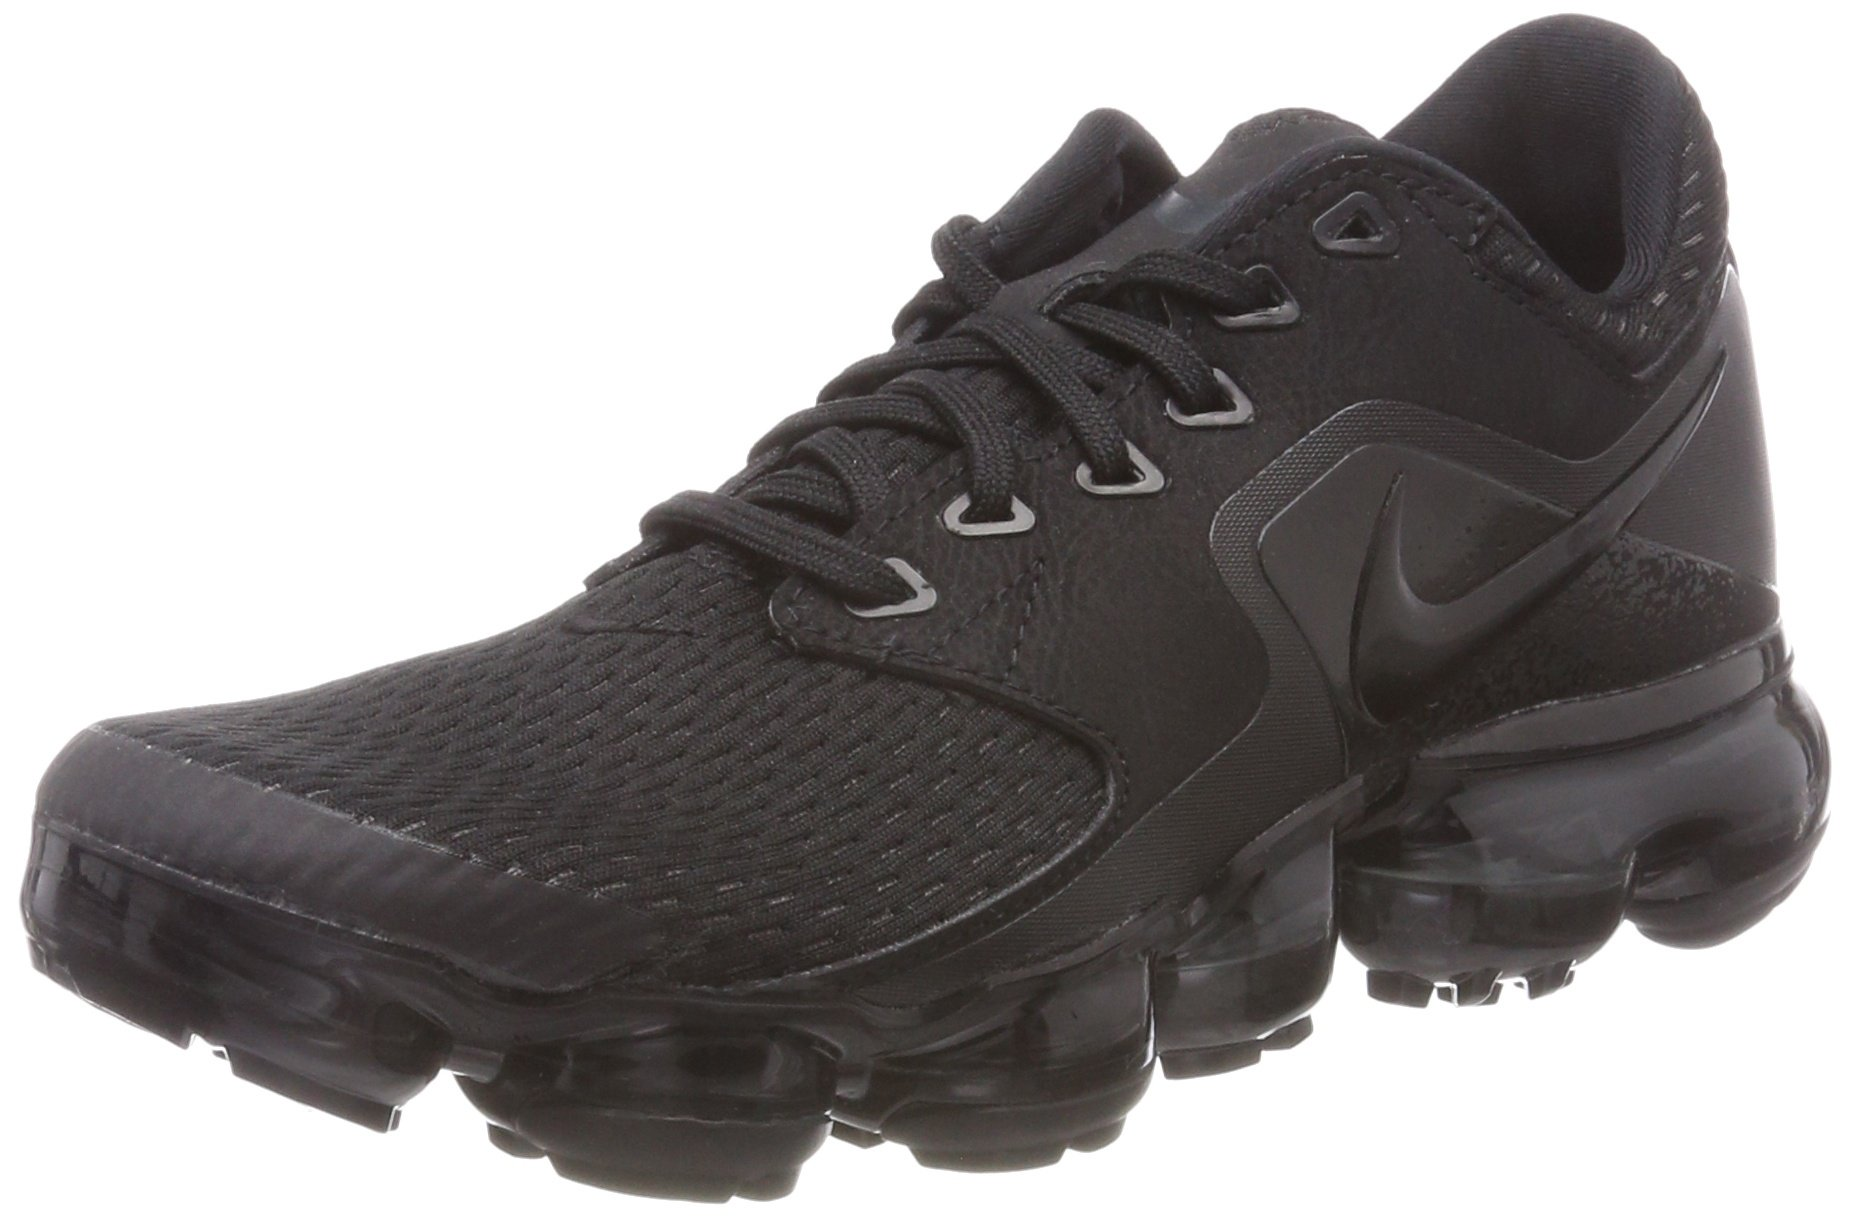 NIKE Kids' Grade School Air Vapormax Running Shoes (Black/Black/Black,5) by NIKE (Image #1)